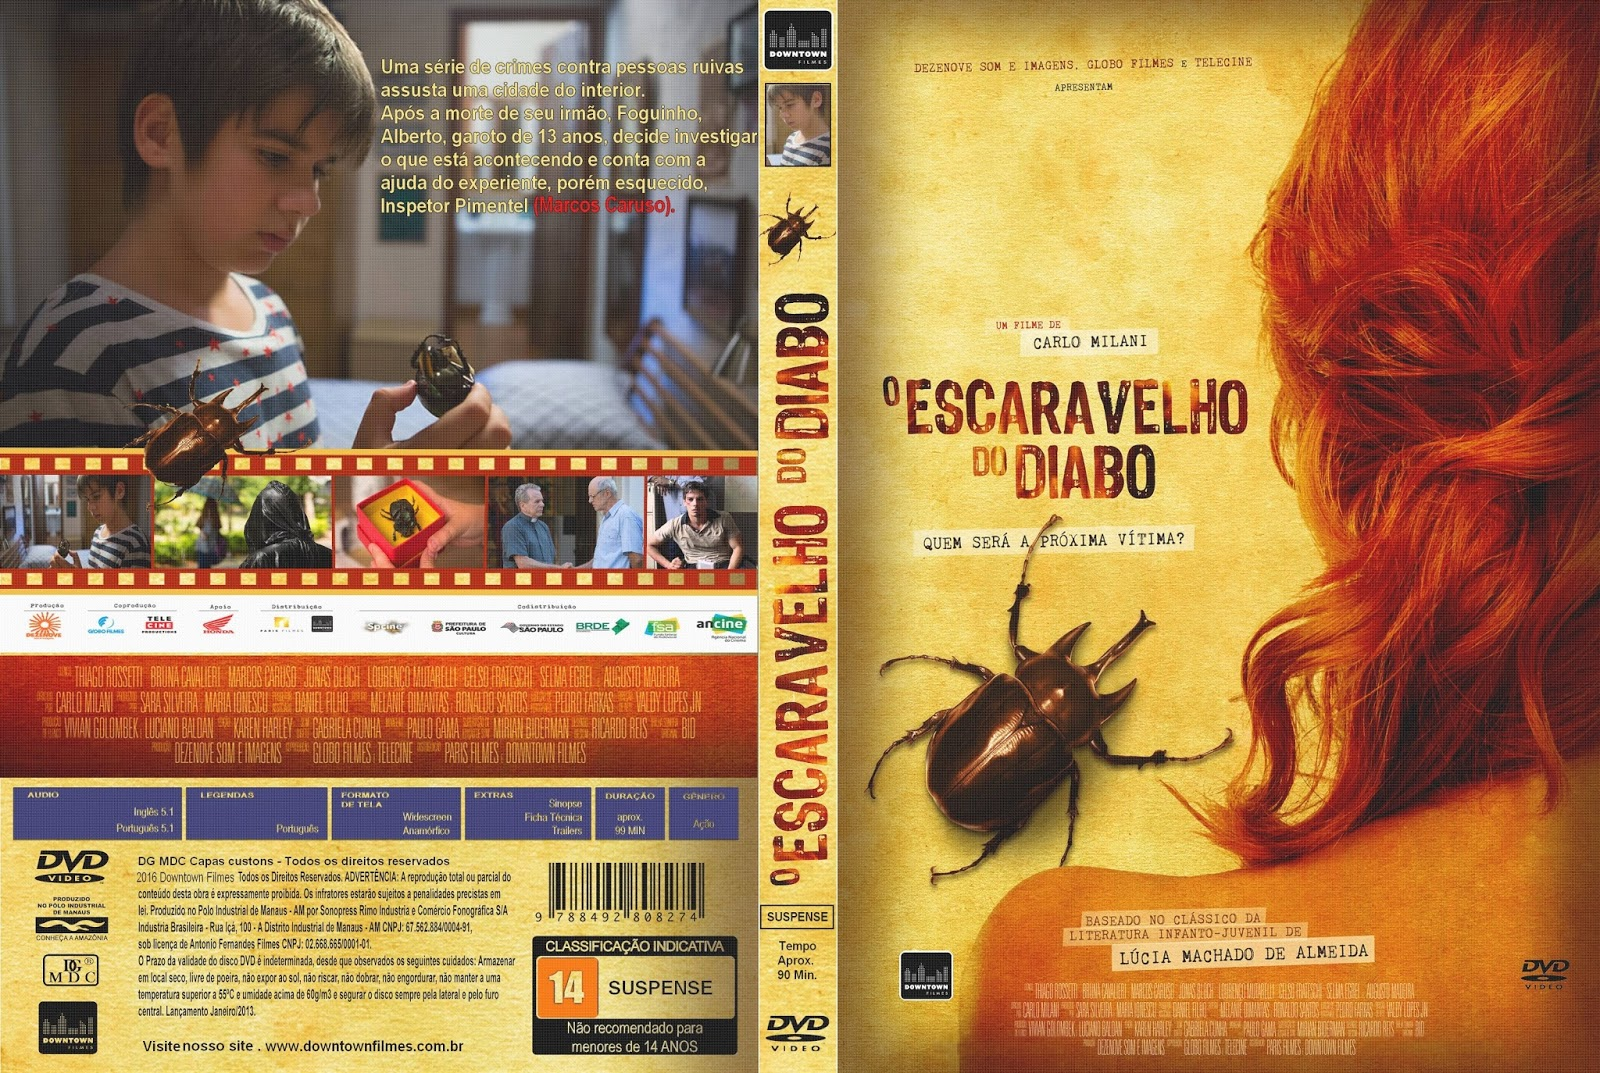 Download O Escaravelho do Diabo DVD-R O 2BEscaravelho 2BDo 2BDiabo 2B 25282016 2529